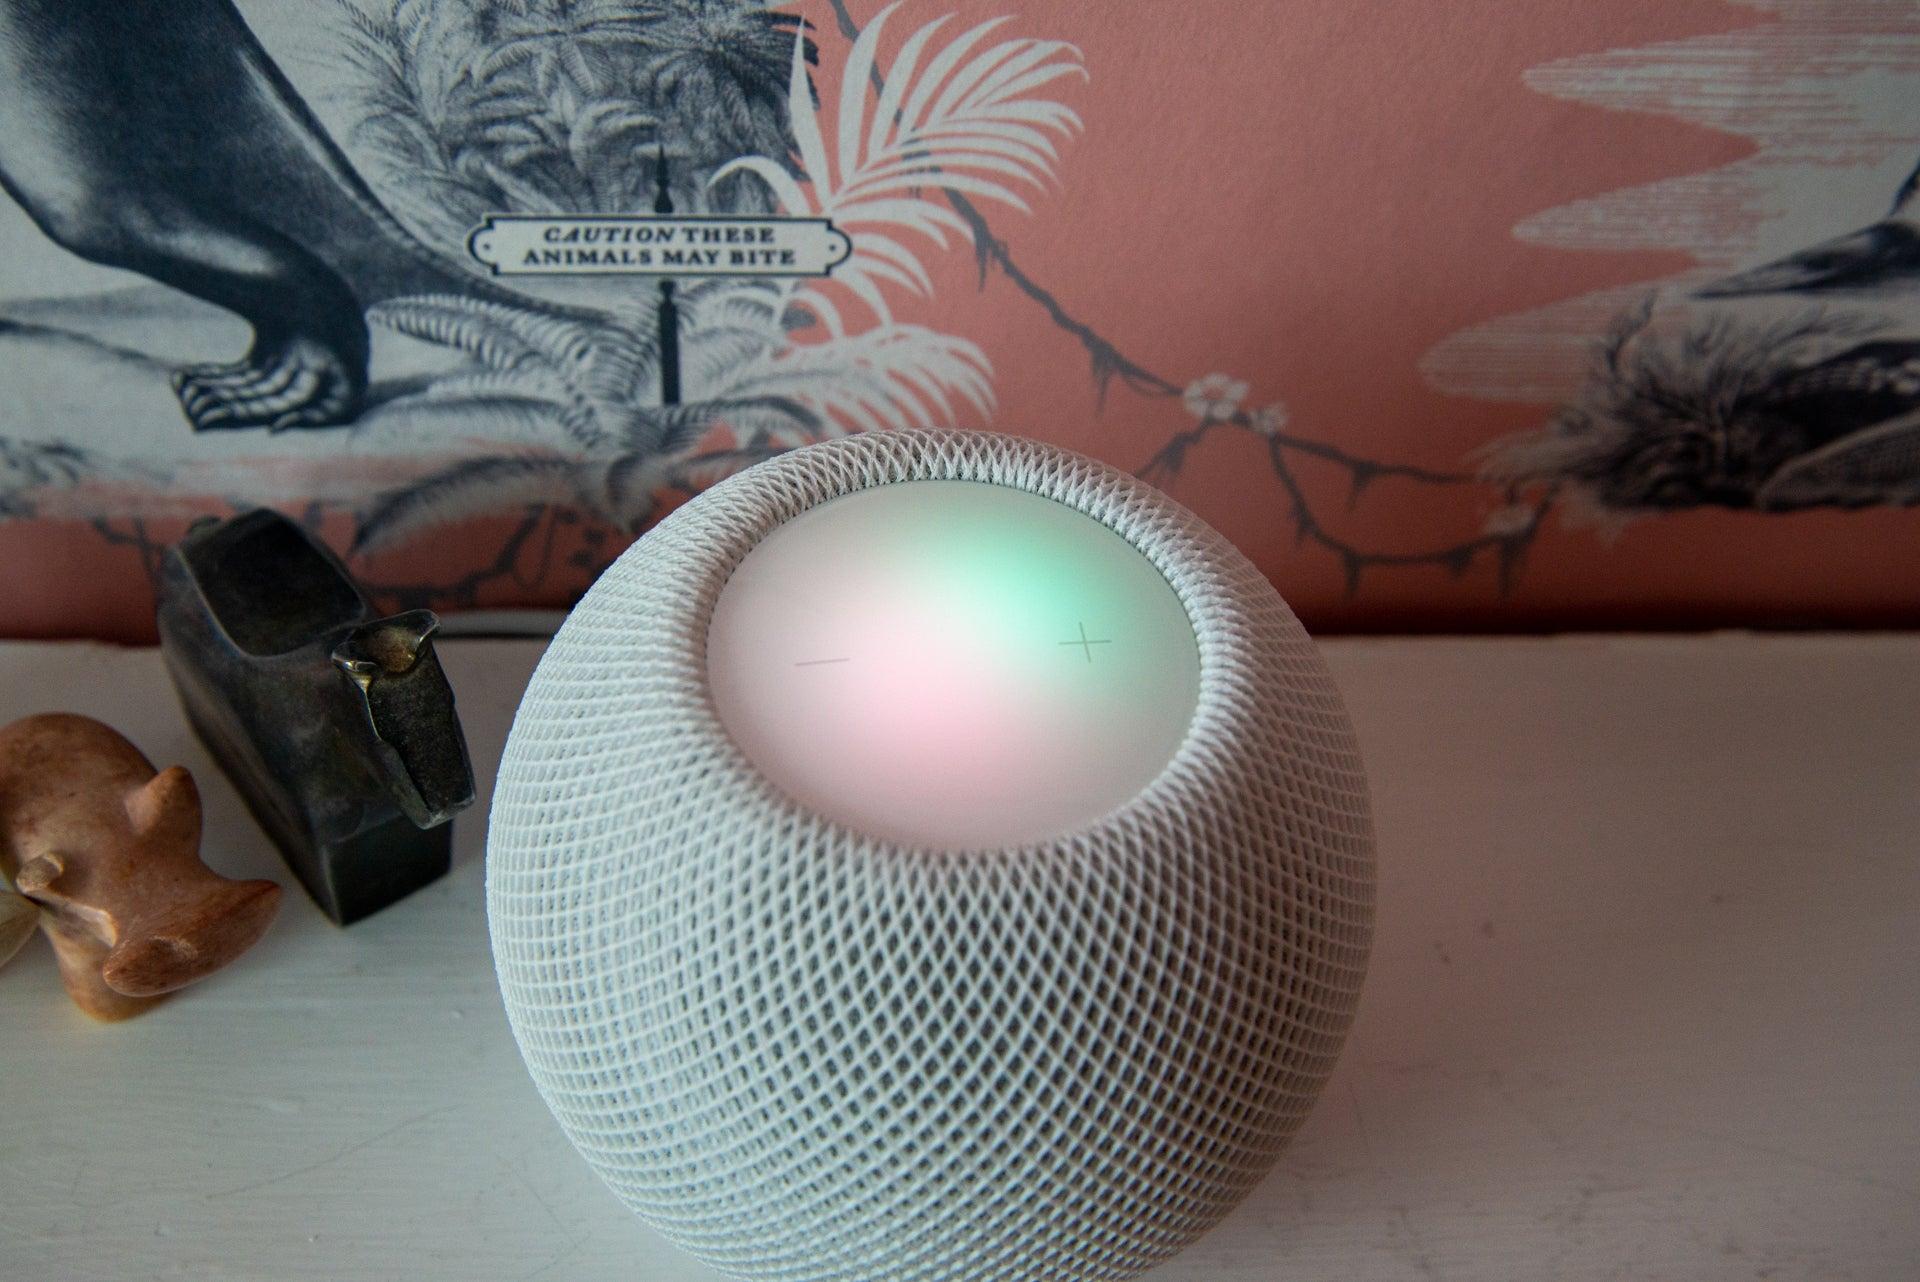 An Apple HomePod smart display would be a guaranteed winner